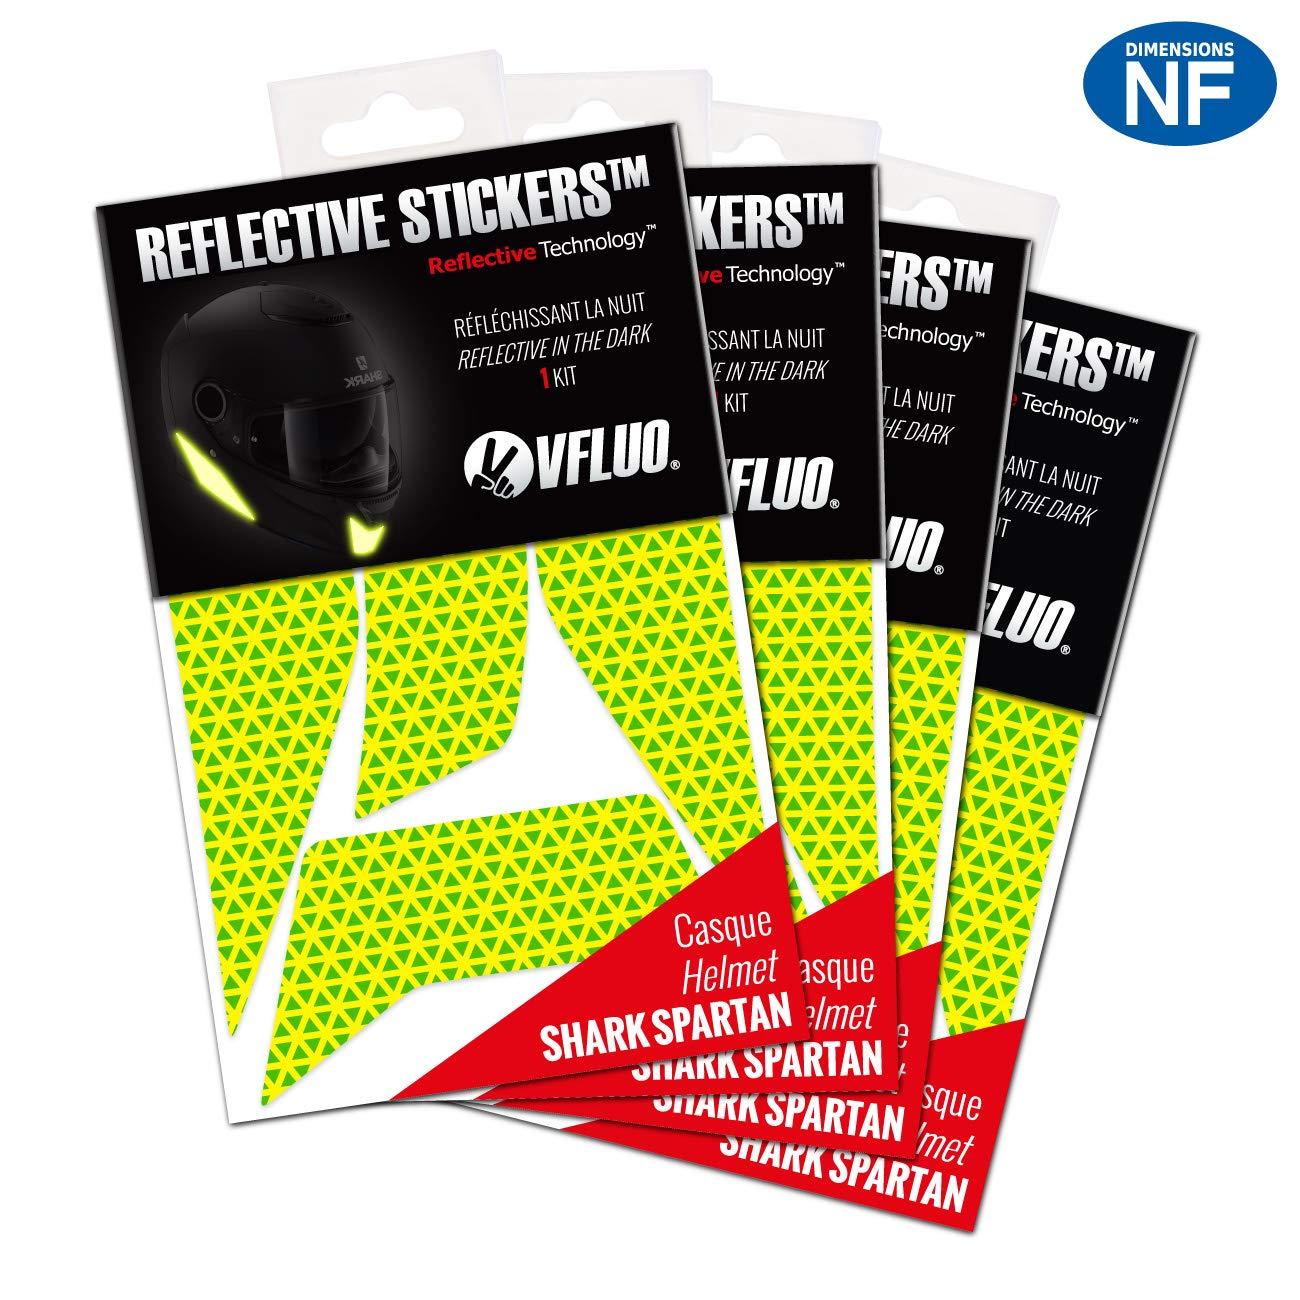 Kit 4 Adhesivos Retro-Reflectantes Casco Shark Spartan/™ y Compatible con Todos los Cascos de Motocicleta Blanco 3M Technology/™ VFLUO Spartan/™